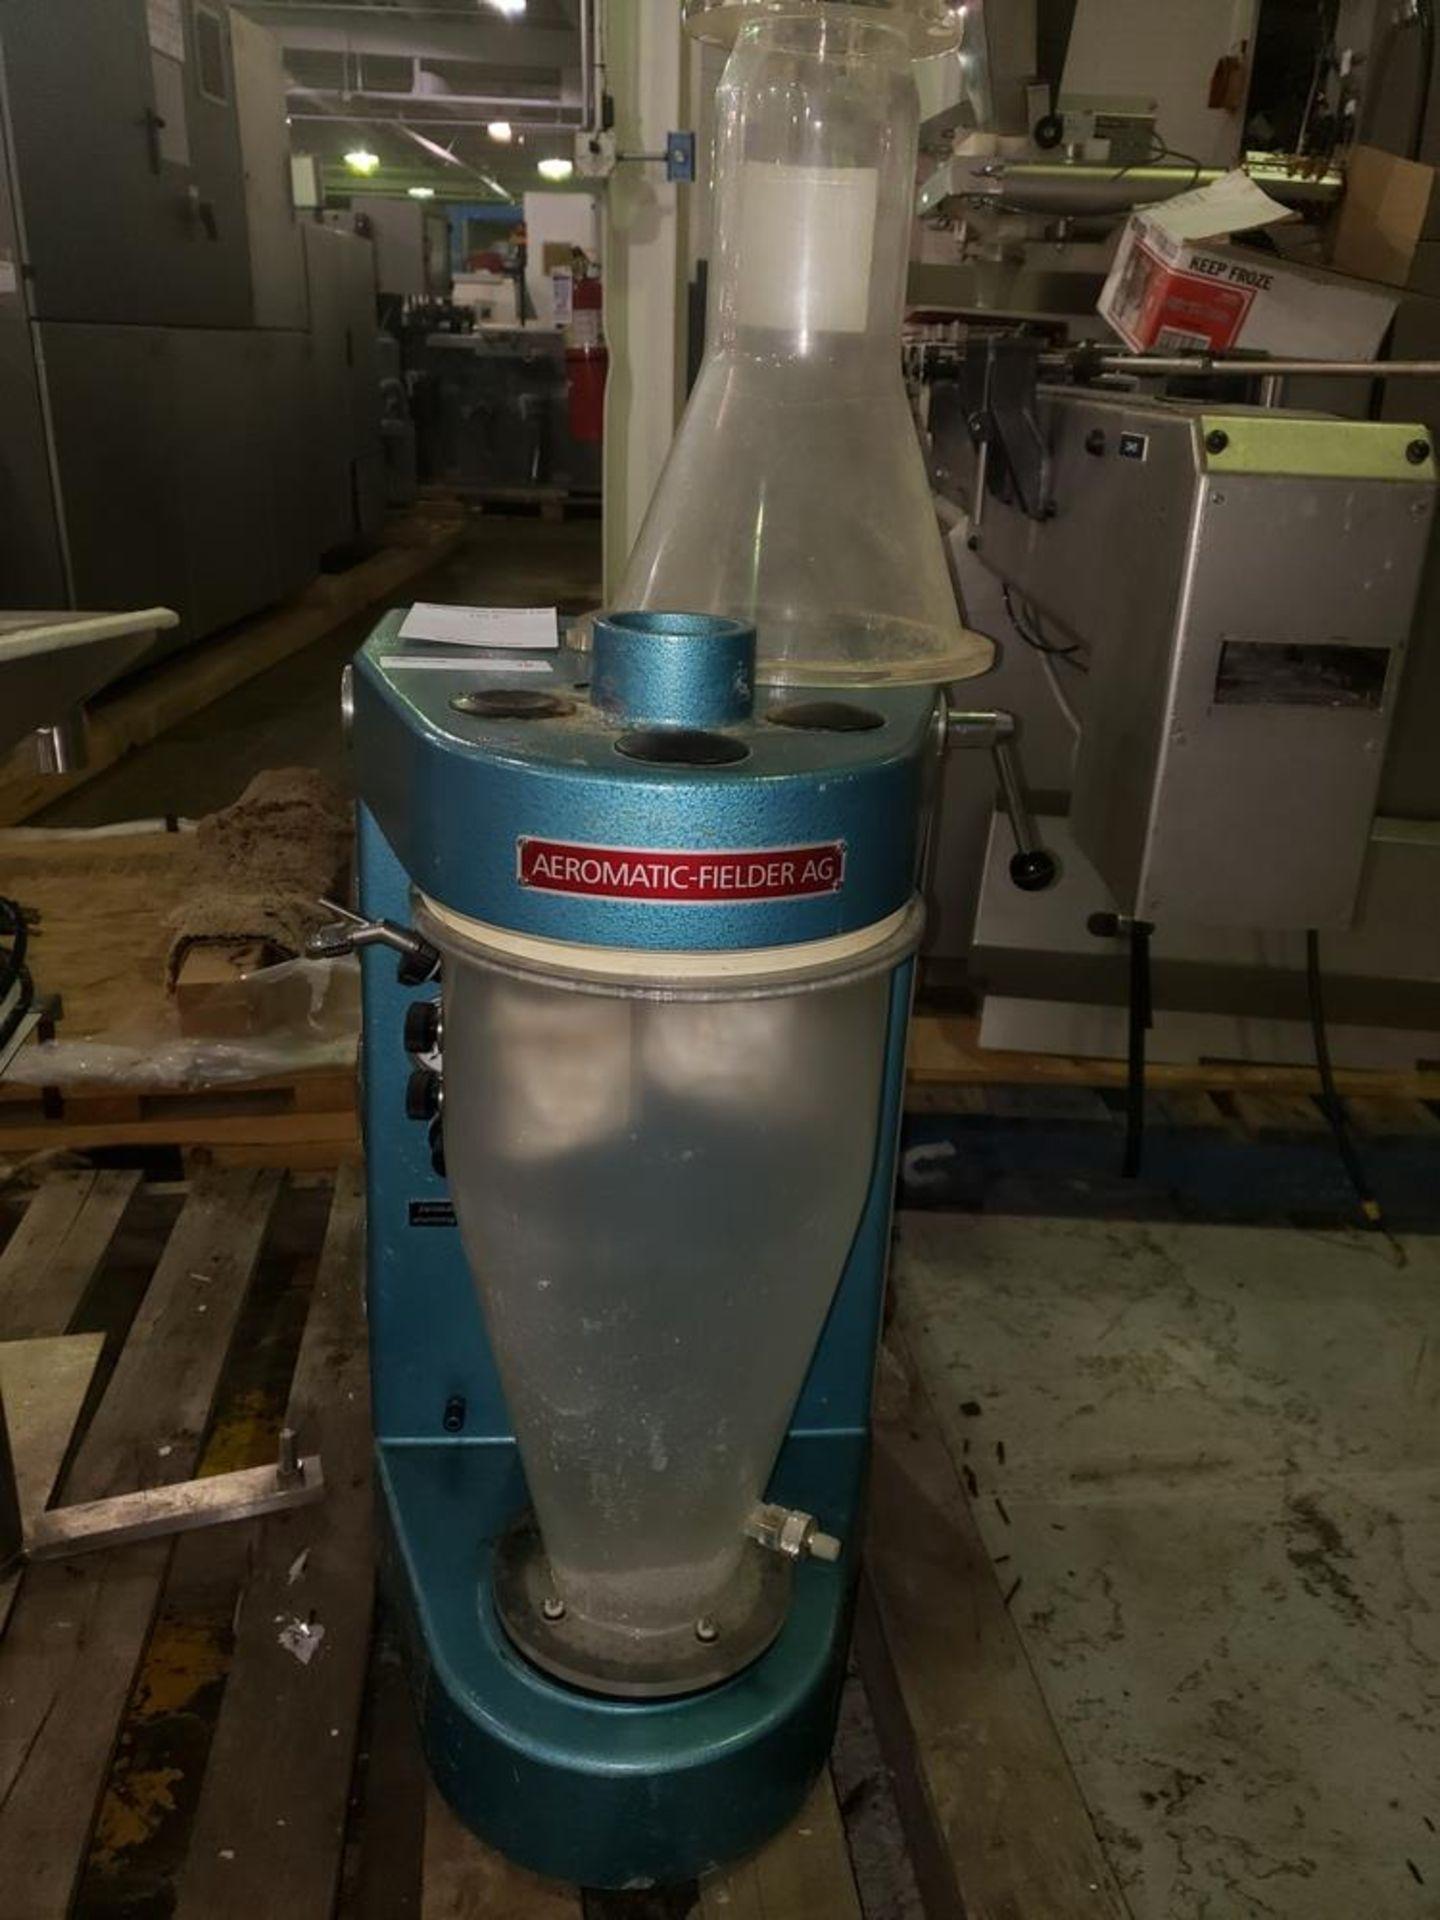 Lot 16 - Aeromatic fluid bed dryer, model STREA1, with (2) plastic shells, top spray gun, 1 kw heater, 110